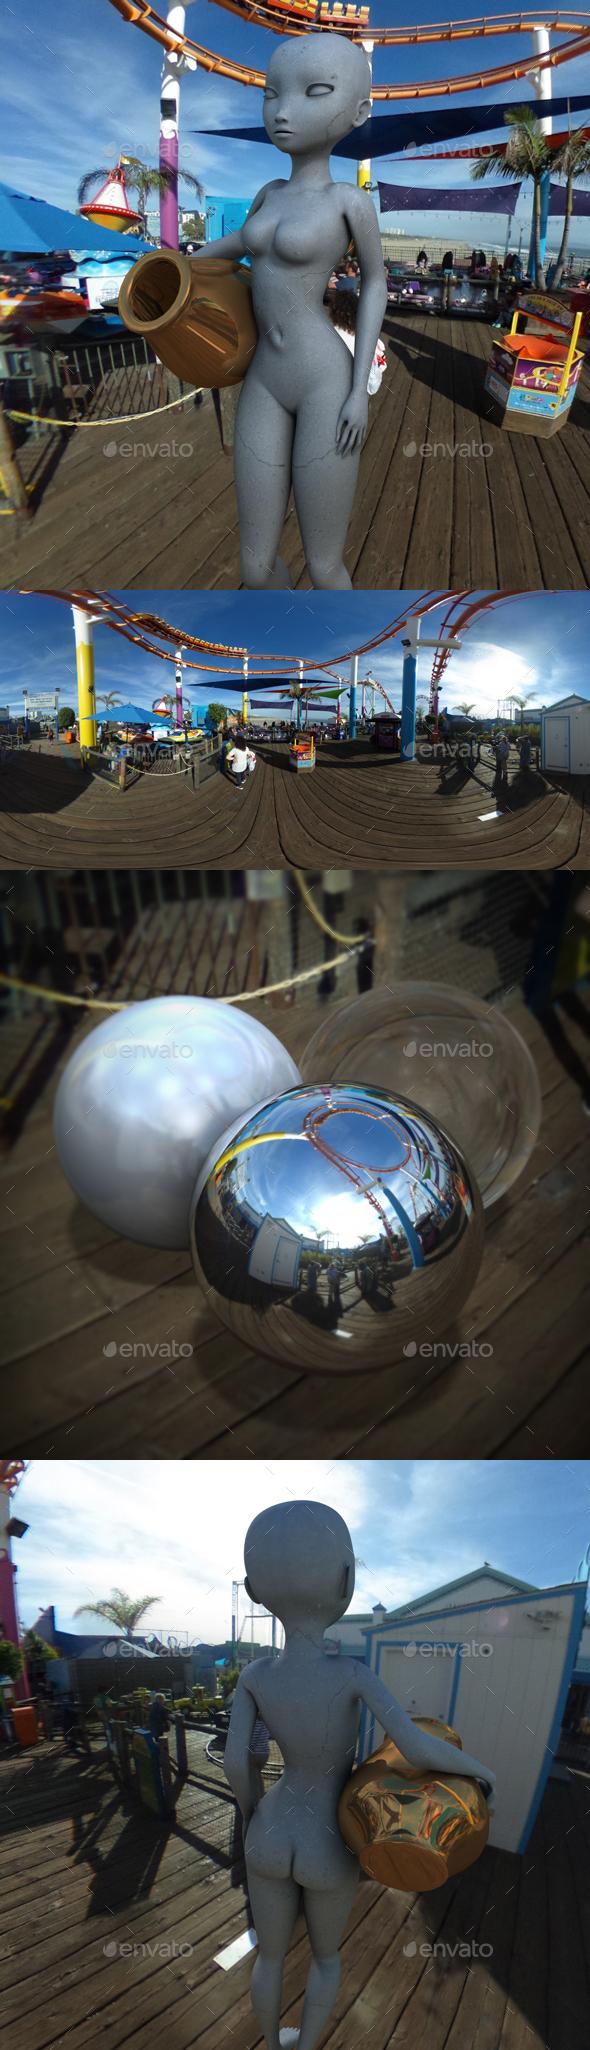 Santa Monica Pier Rides HDRI - 3DOcean Item for Sale